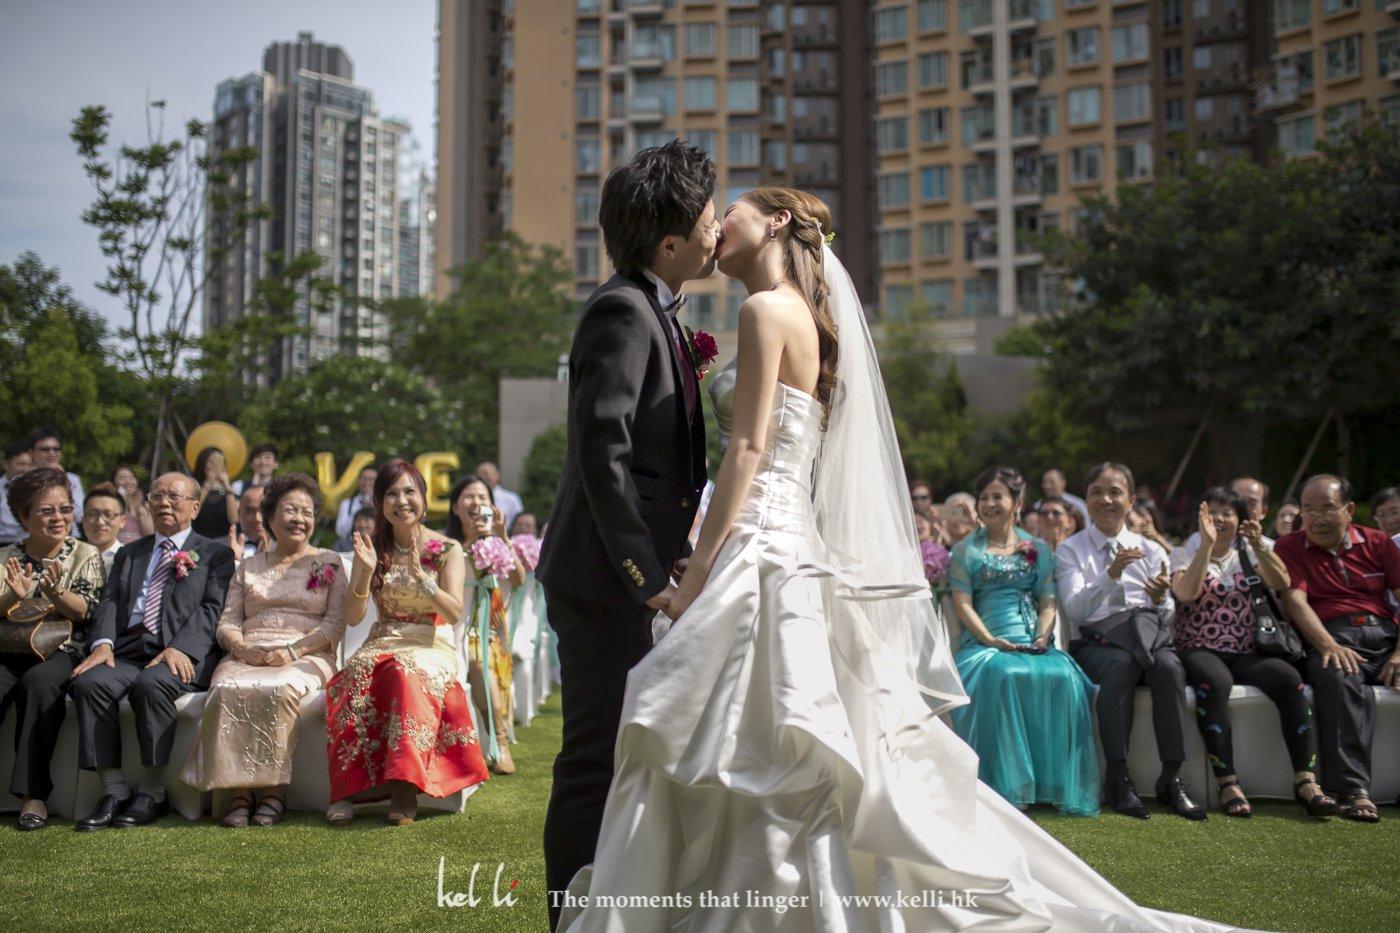 Koody Pixel – a new brand for prewedding & wedding photography